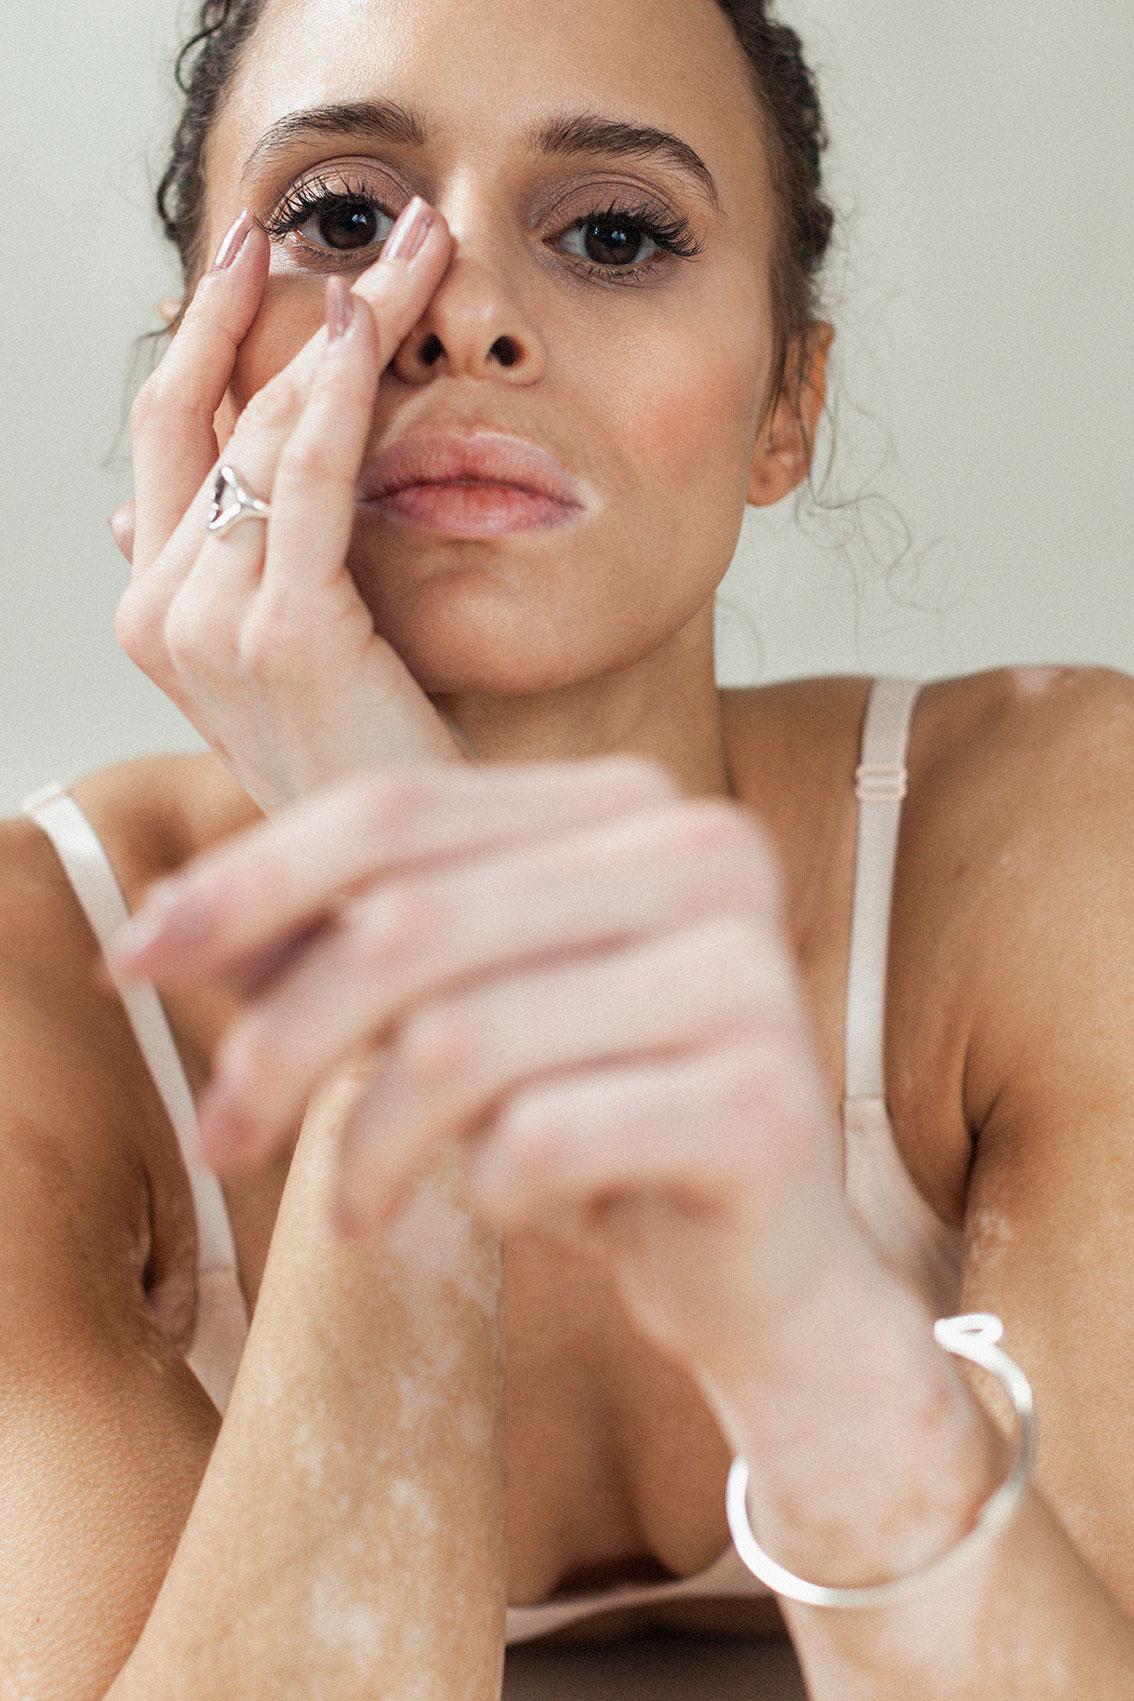 Natalie_Elisabeth-van-Aalderen_vitiligo_1